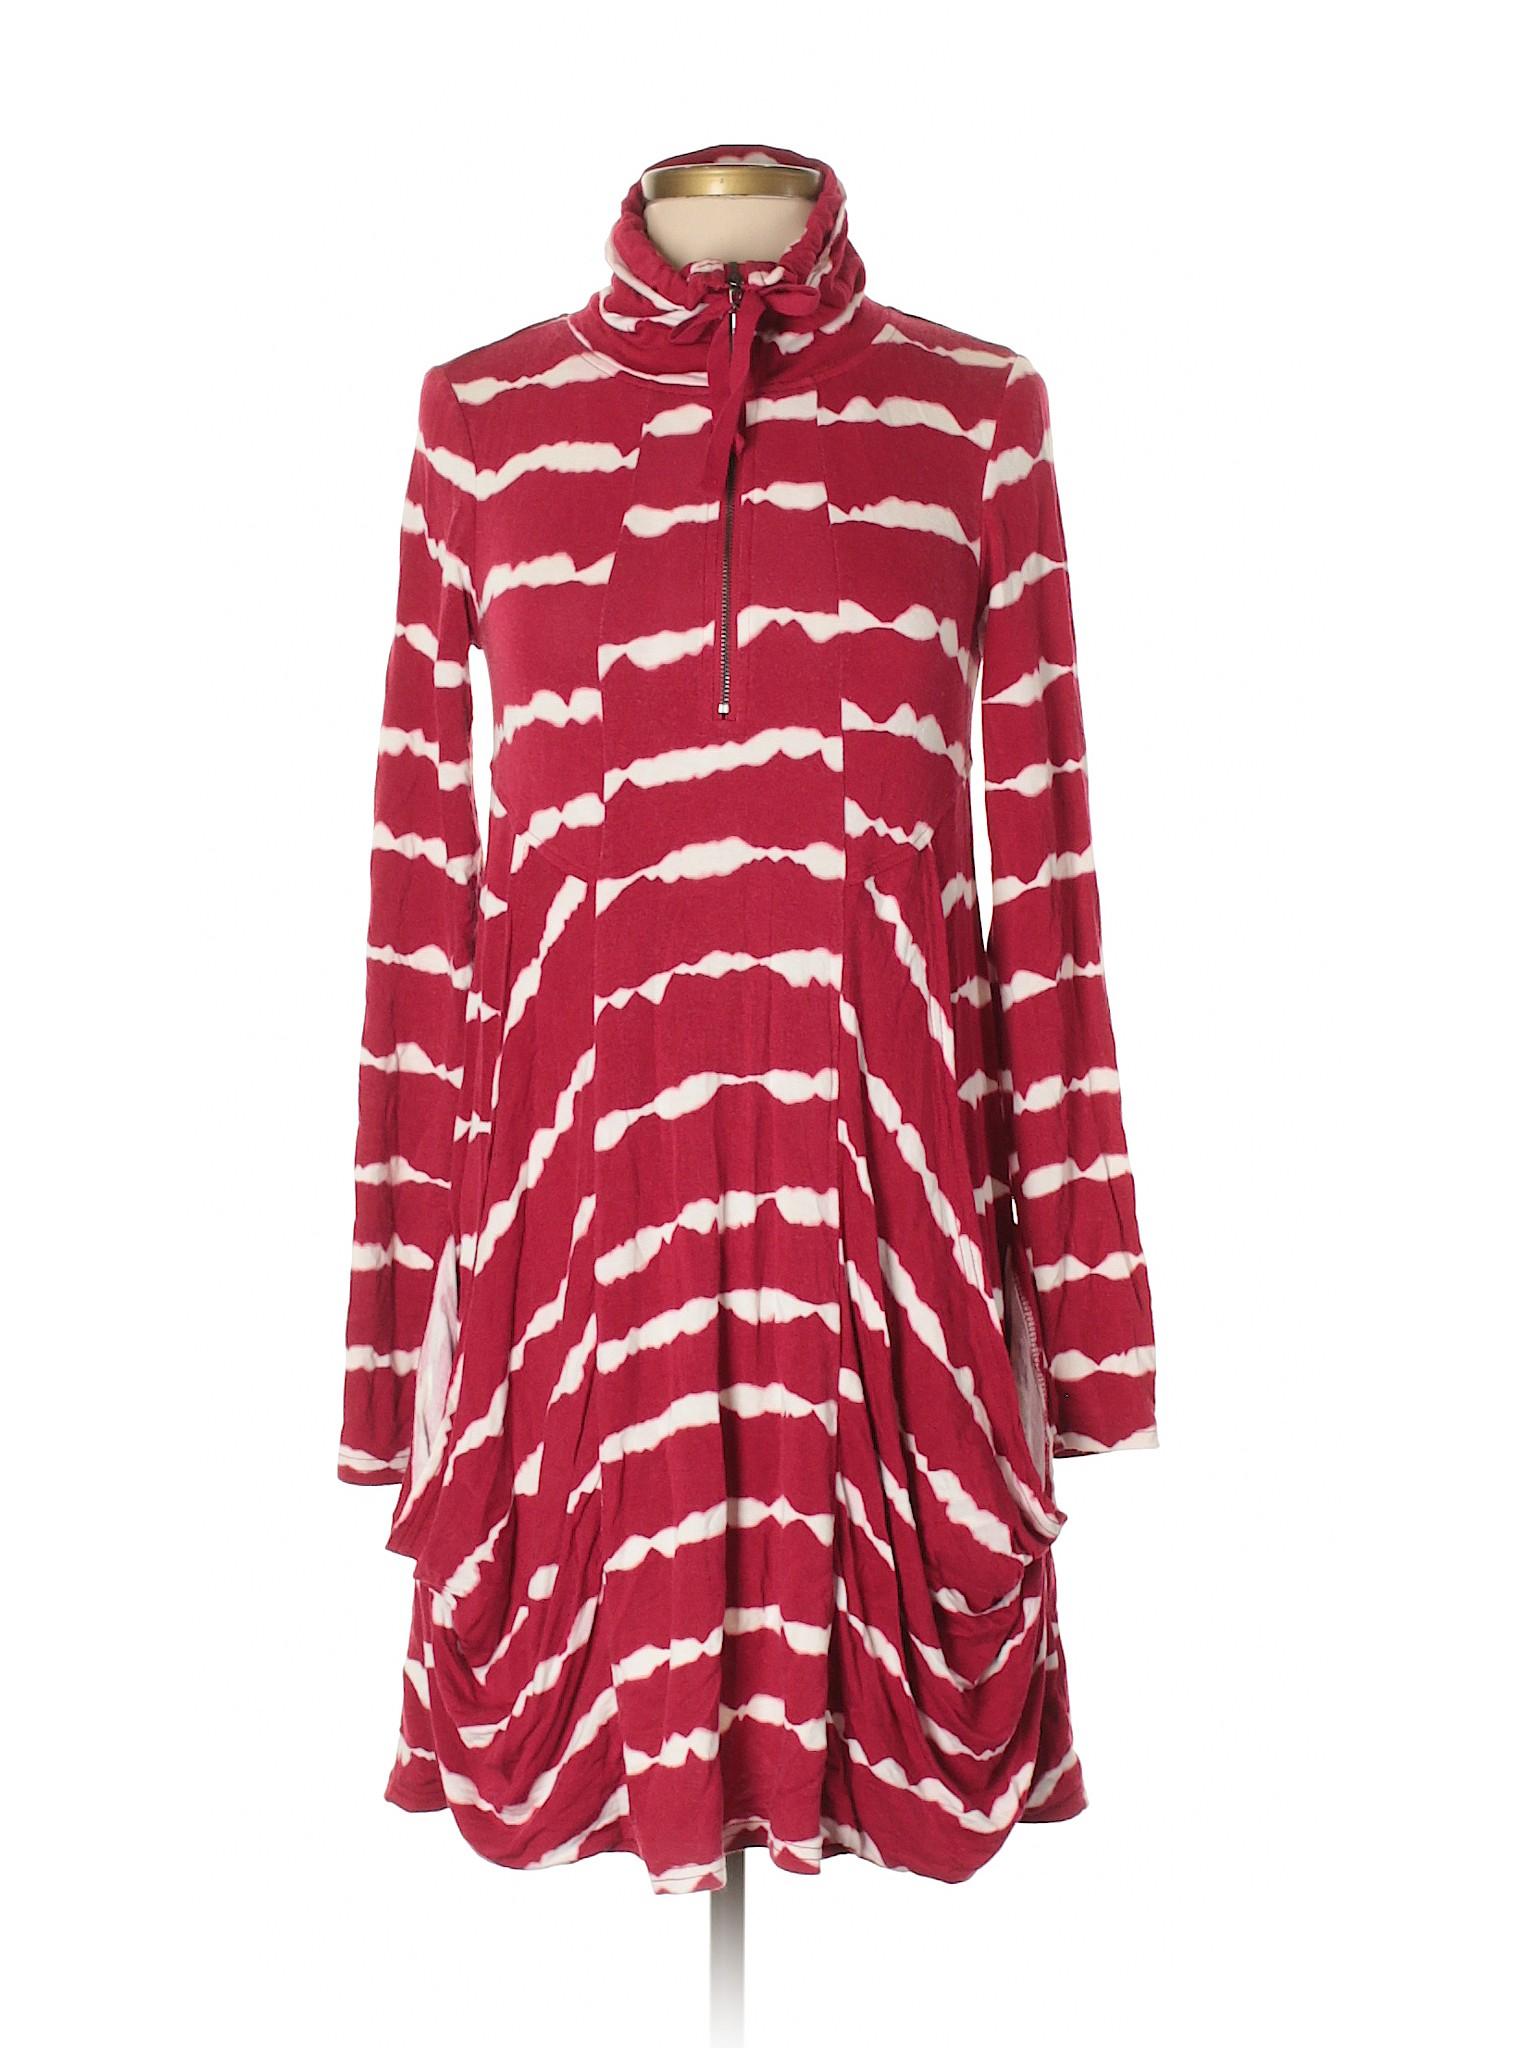 Casual Selling Dress Casual Kensie Selling Selling Kensie Selling Dress Kensie Kensie Casual Dress wqH8zt